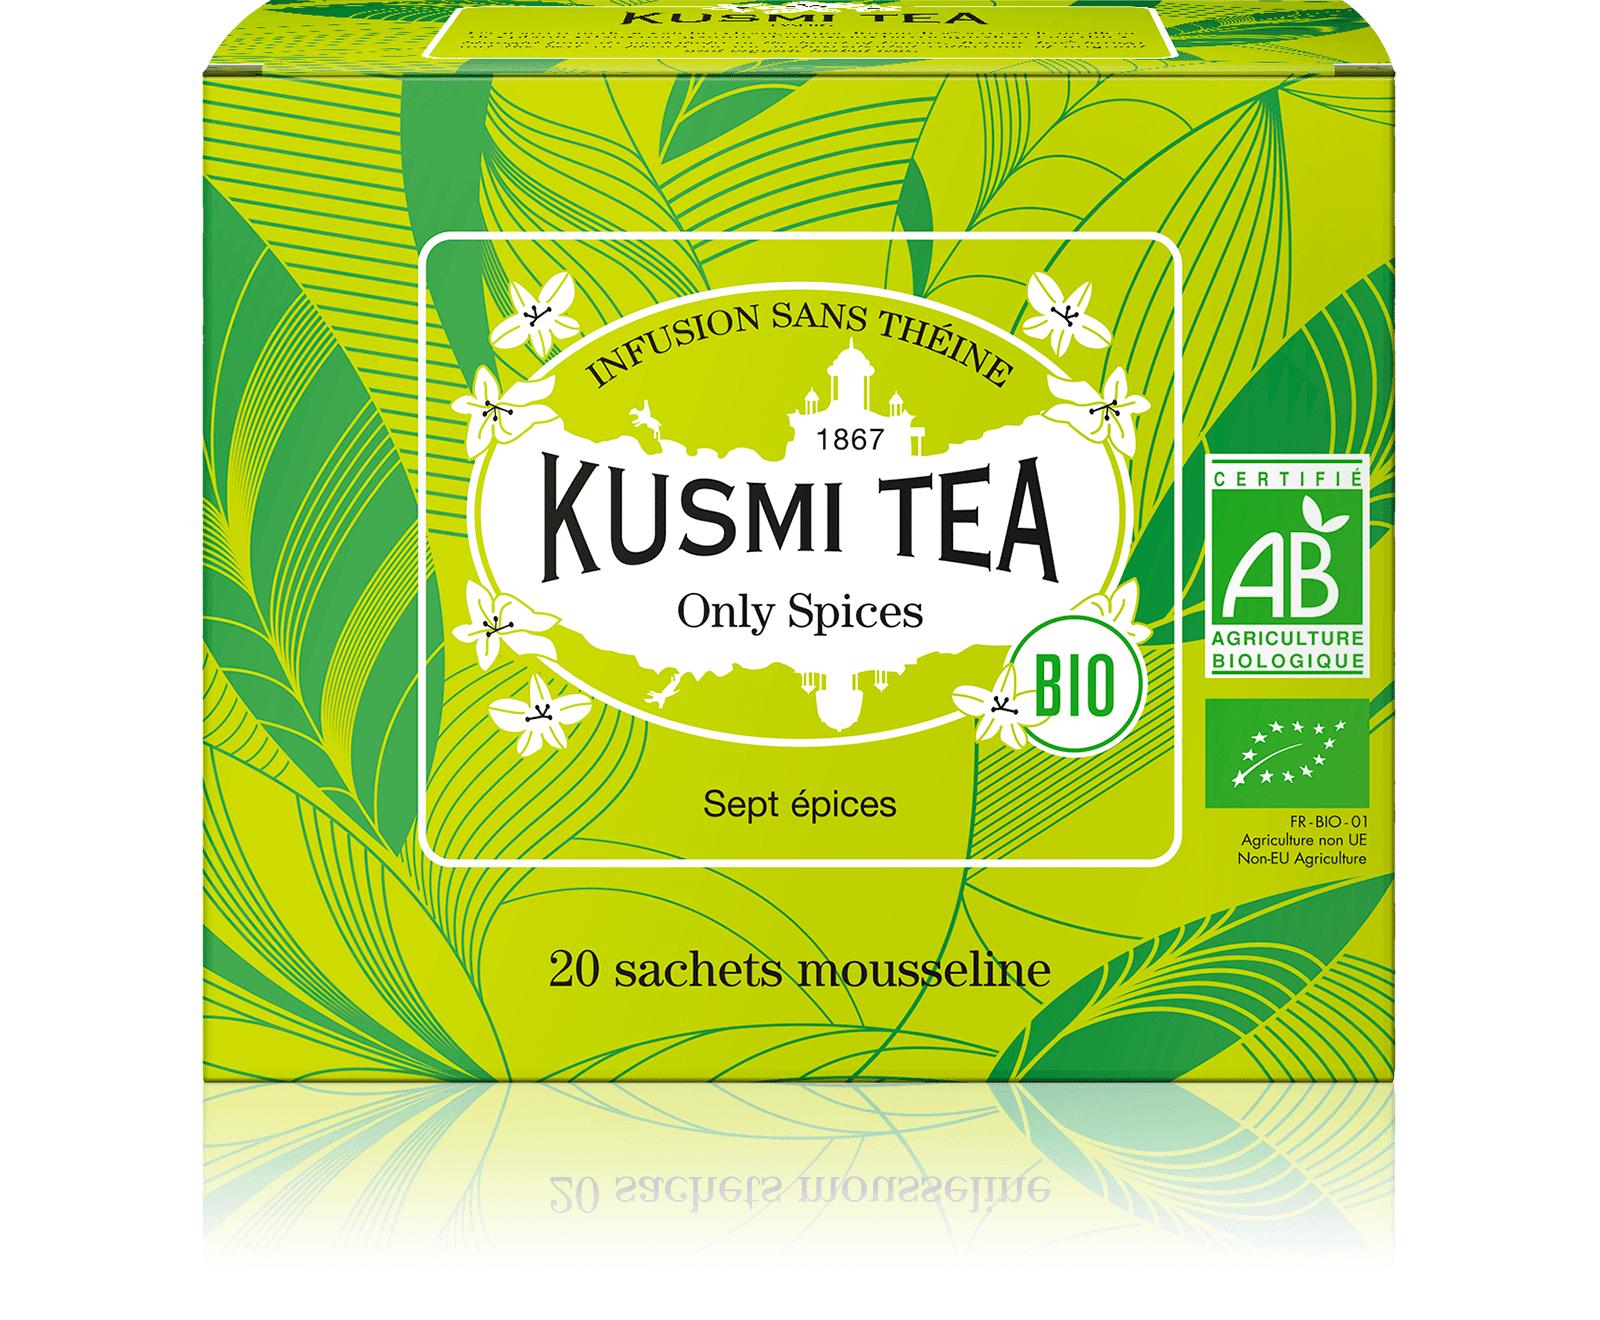 KUSMI TEA Only Spices (Infusion bio) Kusmi Tea